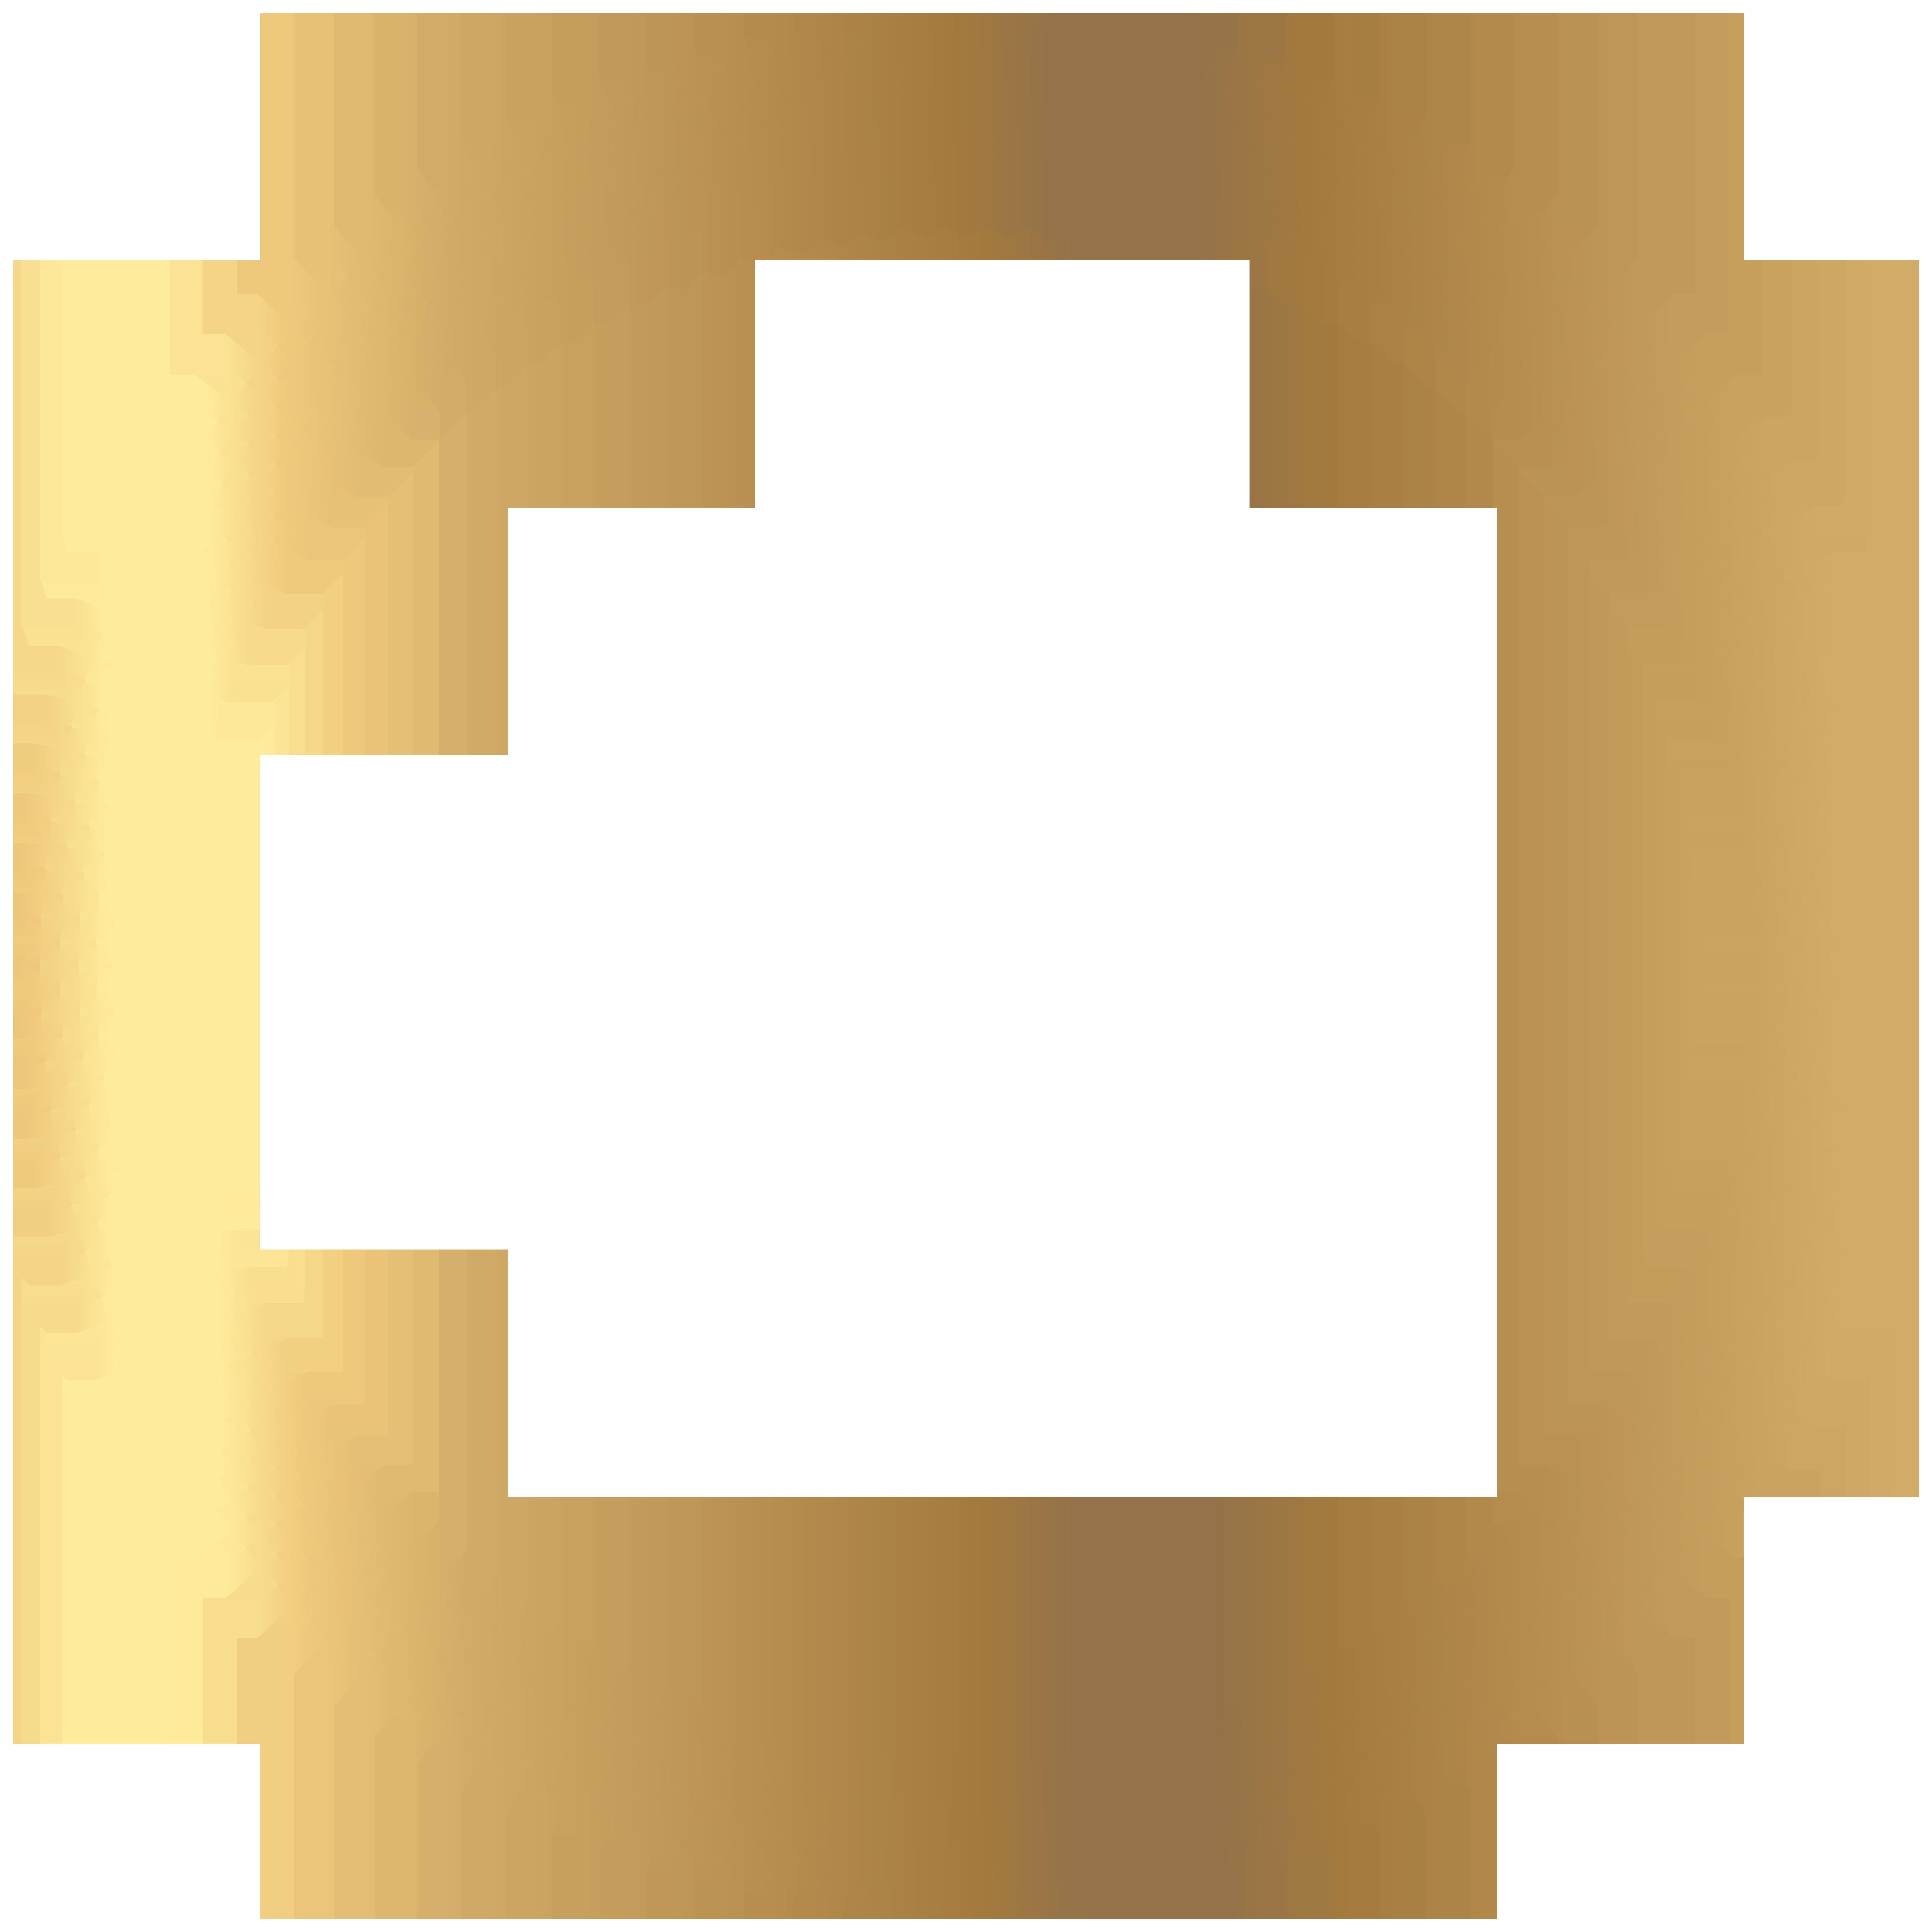 8000x8000 Deco Gold Round Border Png Transparent Clip Artu200b Gallery